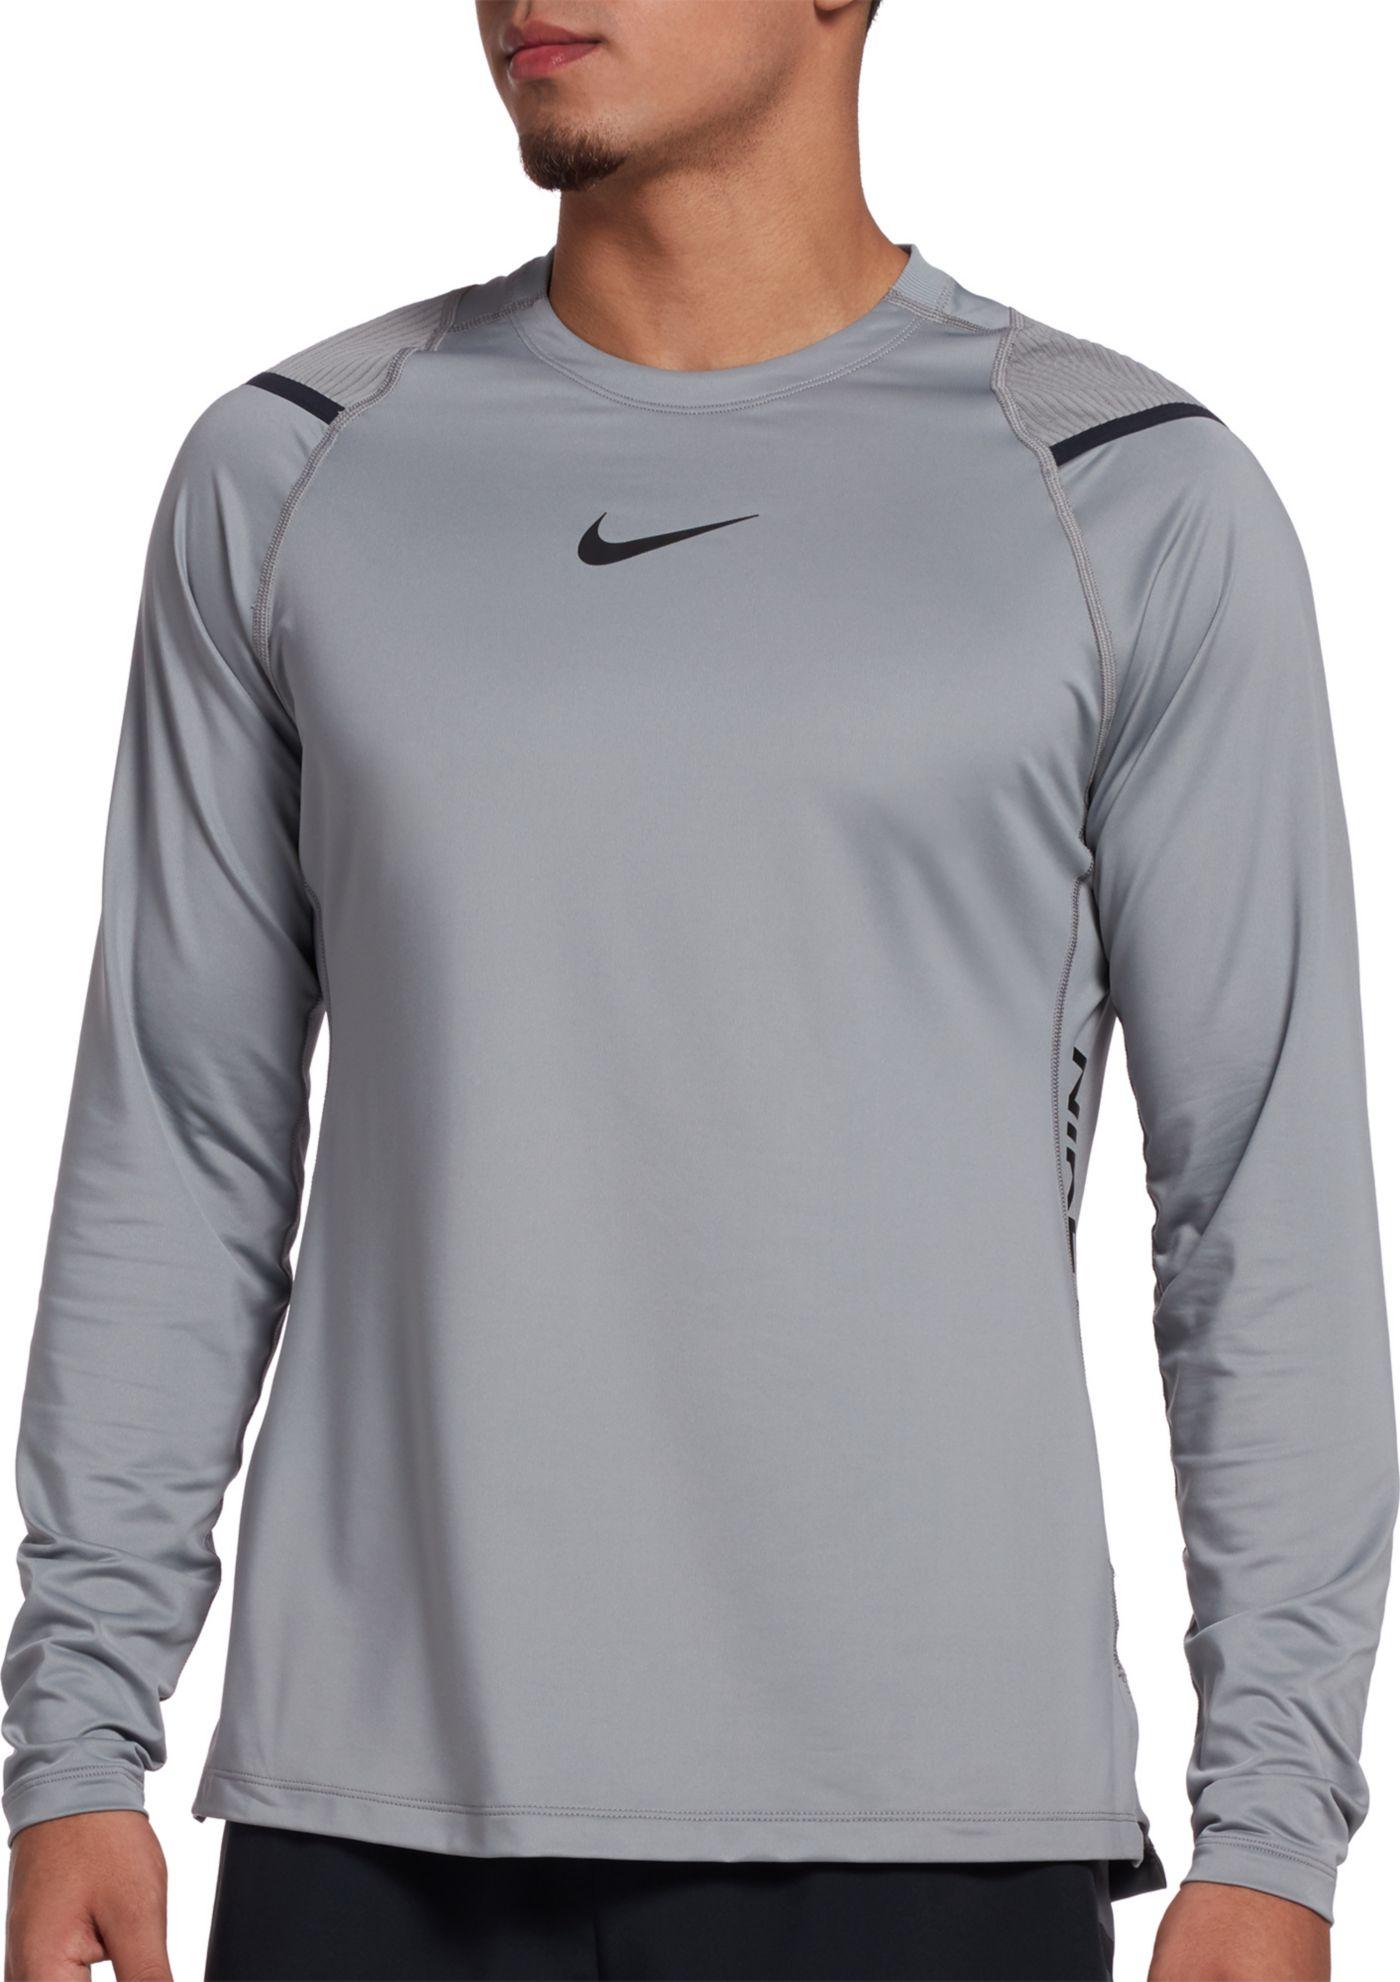 Nike Men's Pro AeroAdapt Long Sleeve Shirt